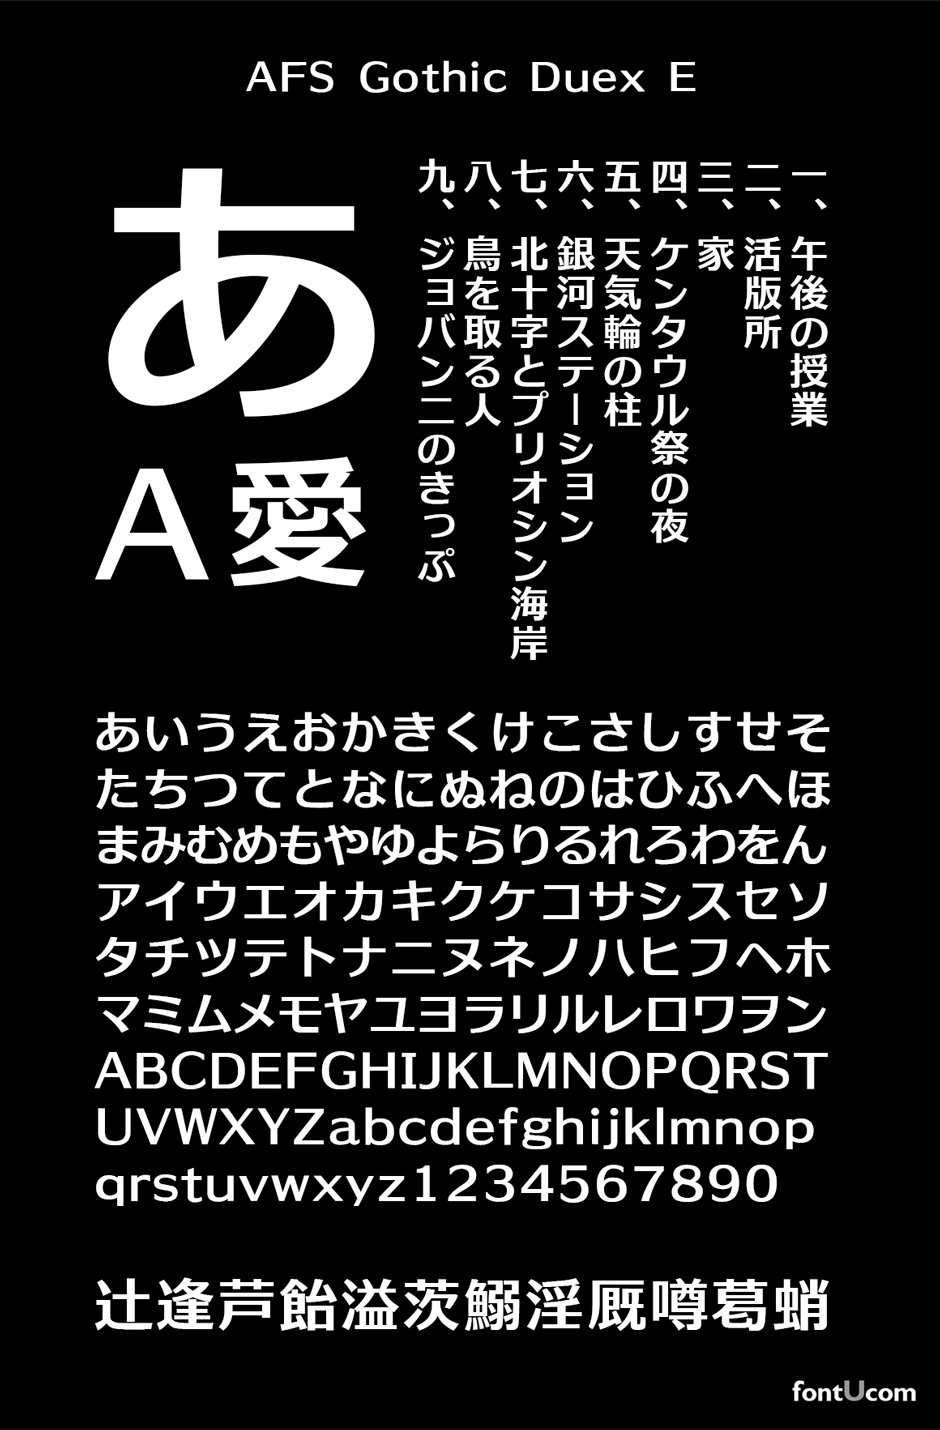 AFS GothicDuex E